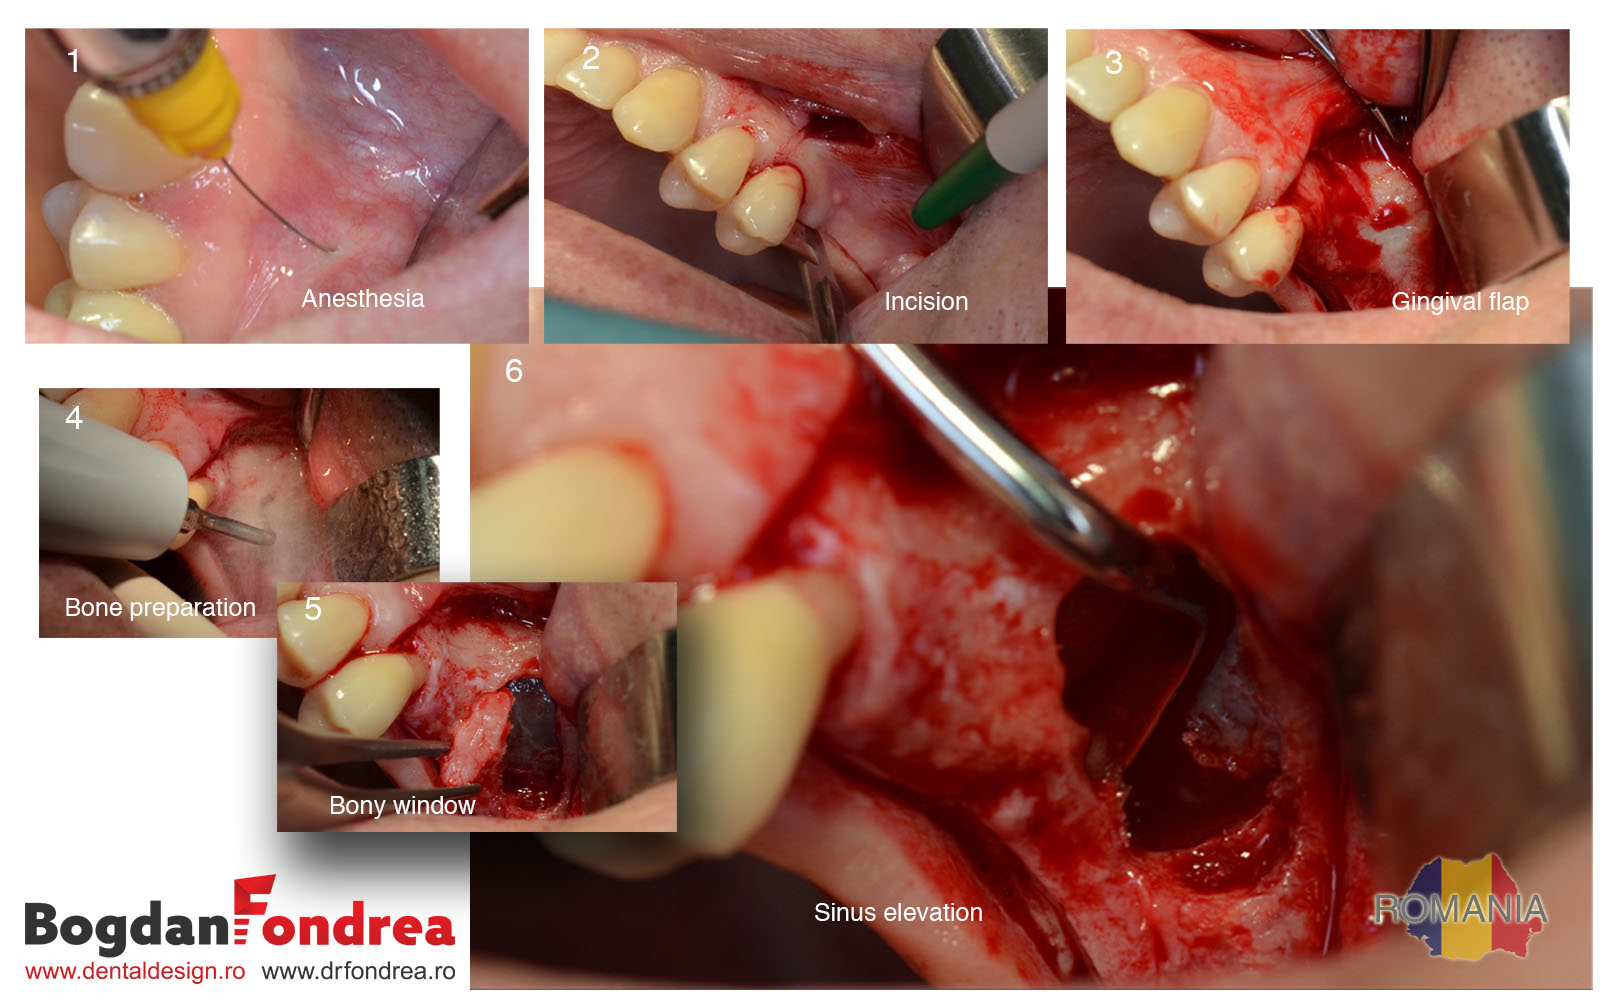 2 A PRF sinus slift Bogdan Fondrea implanturi Timisoara